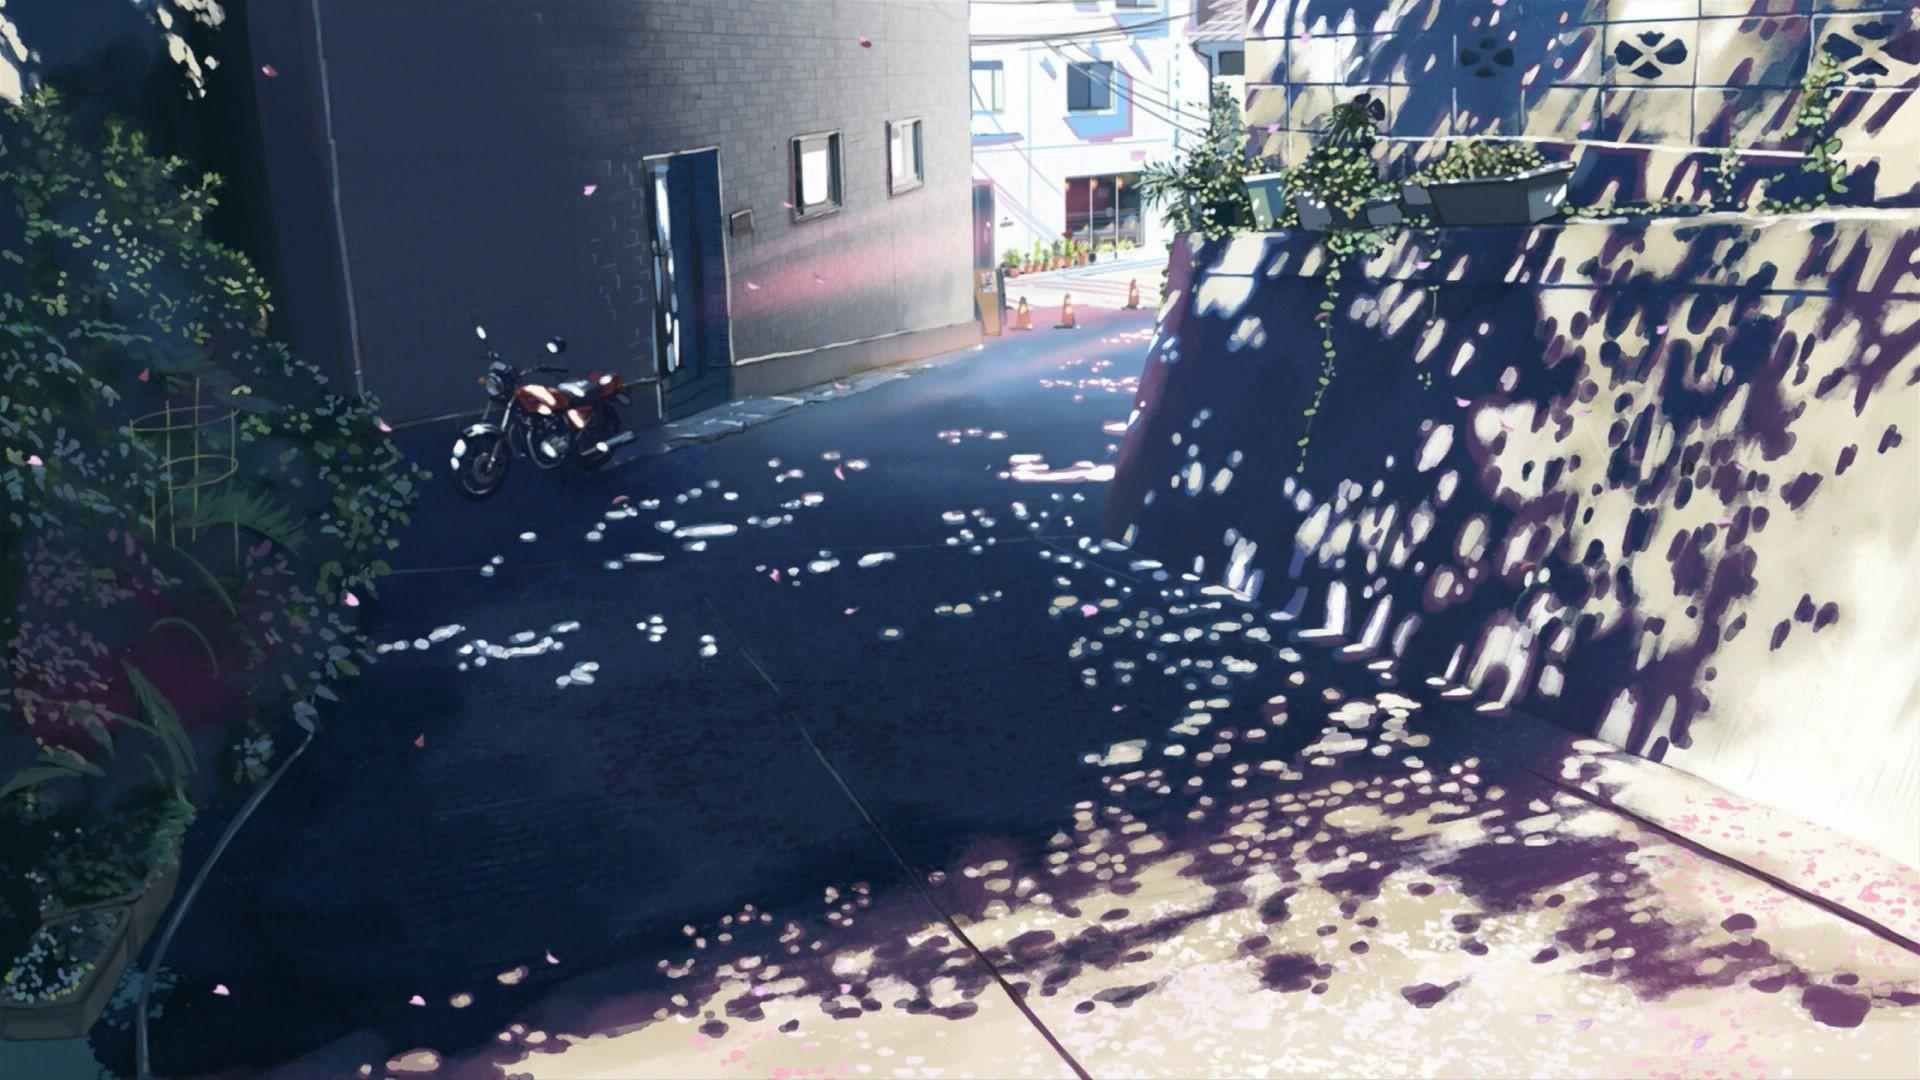 Wallpaper : Sunlight, Anime, Reflection, Plants, Snow, 5